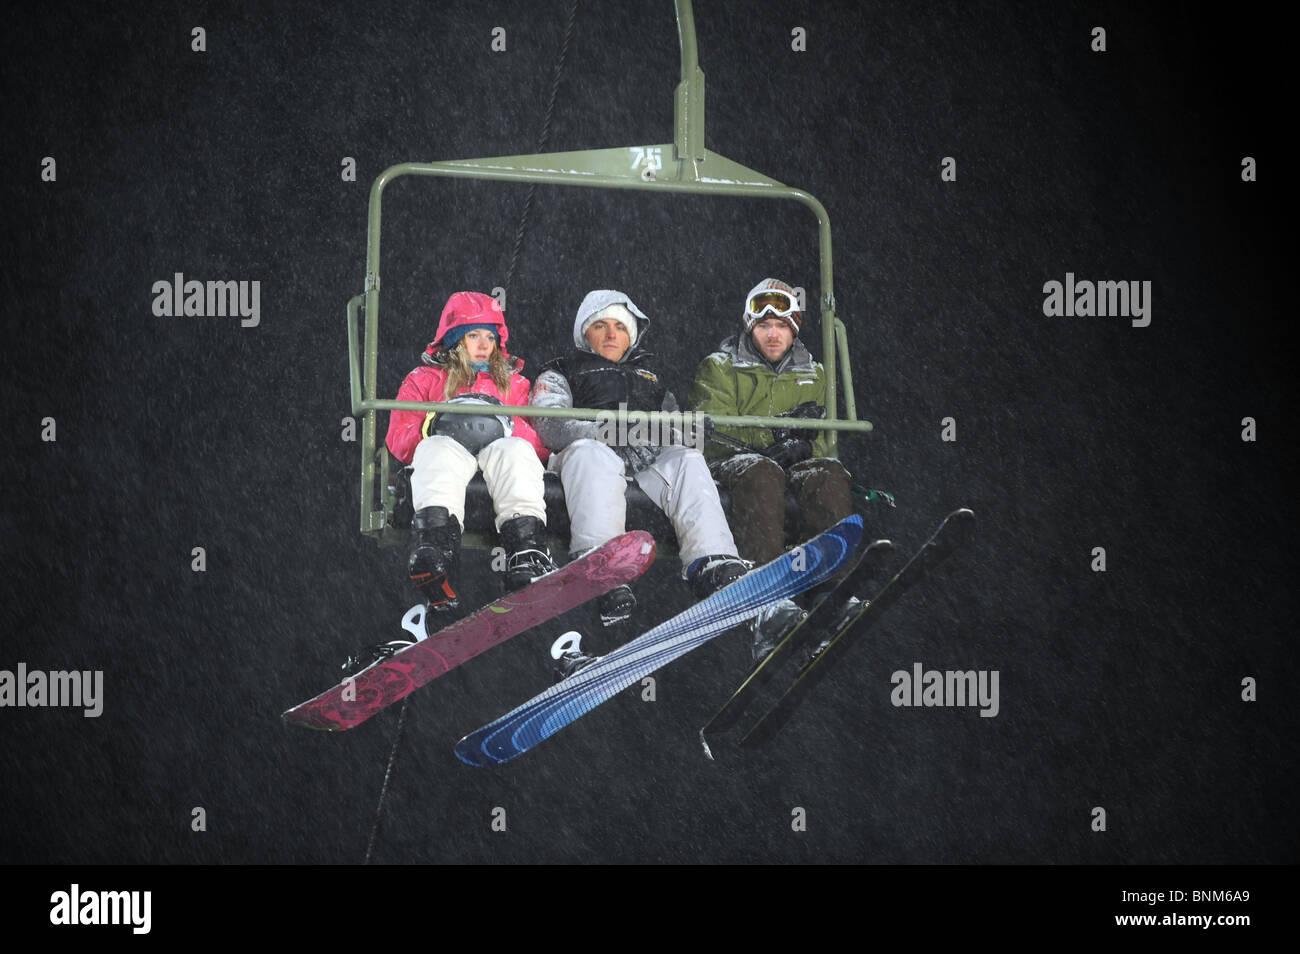 Congelati (2010) Shawn Ashmore, Emma bell, Kevin zengers adam verde (dir) 001 collezione moviestore ltd Immagini Stock